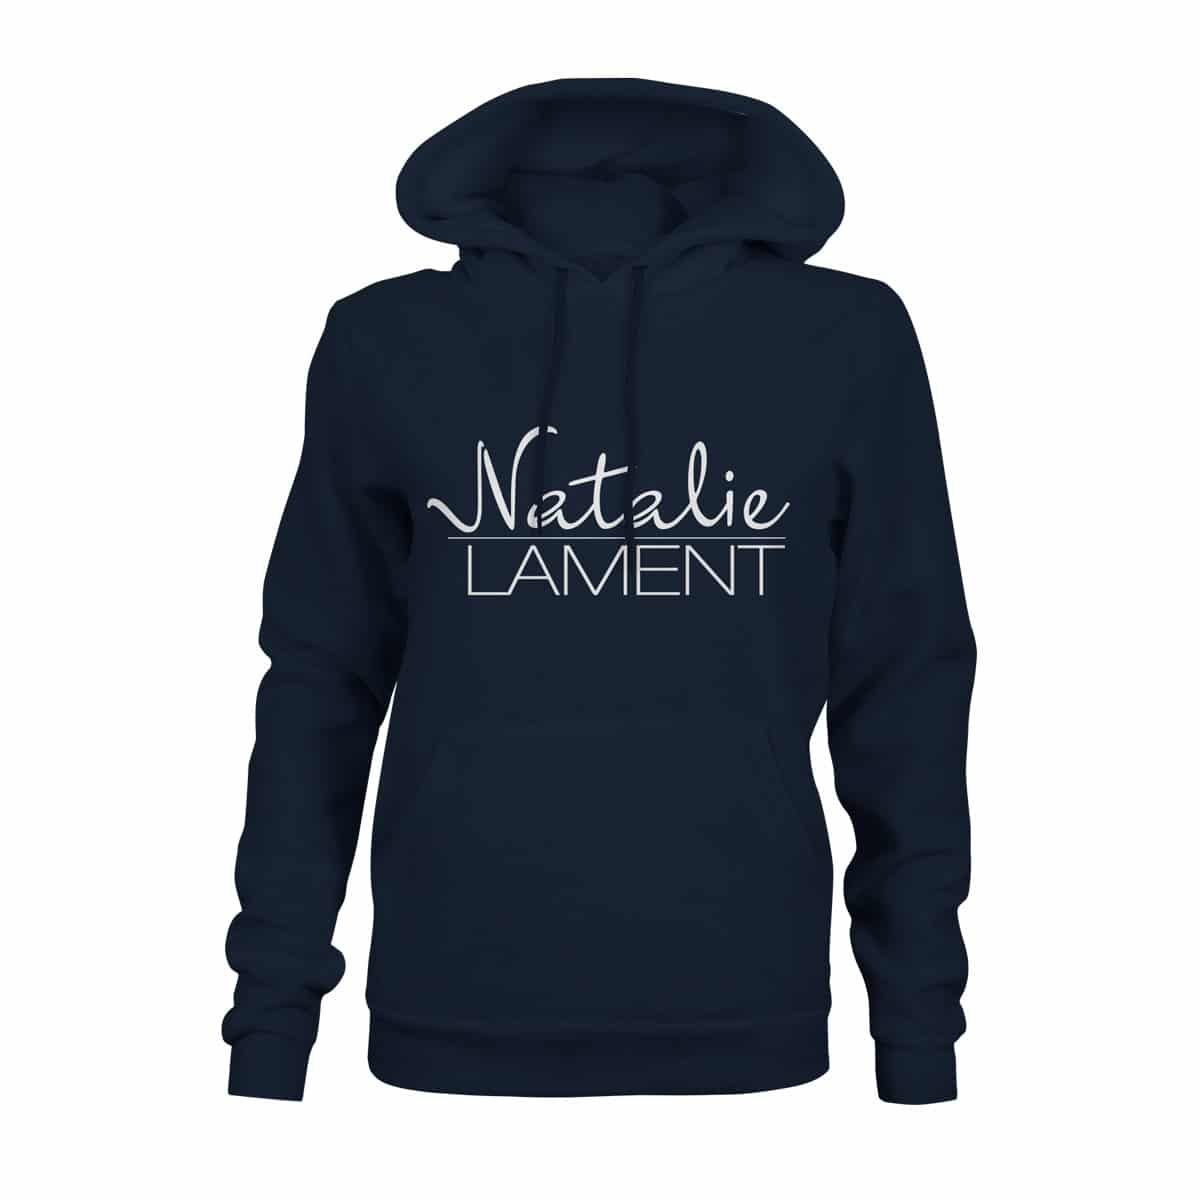 Hoodie Damen Natalie Lament navy